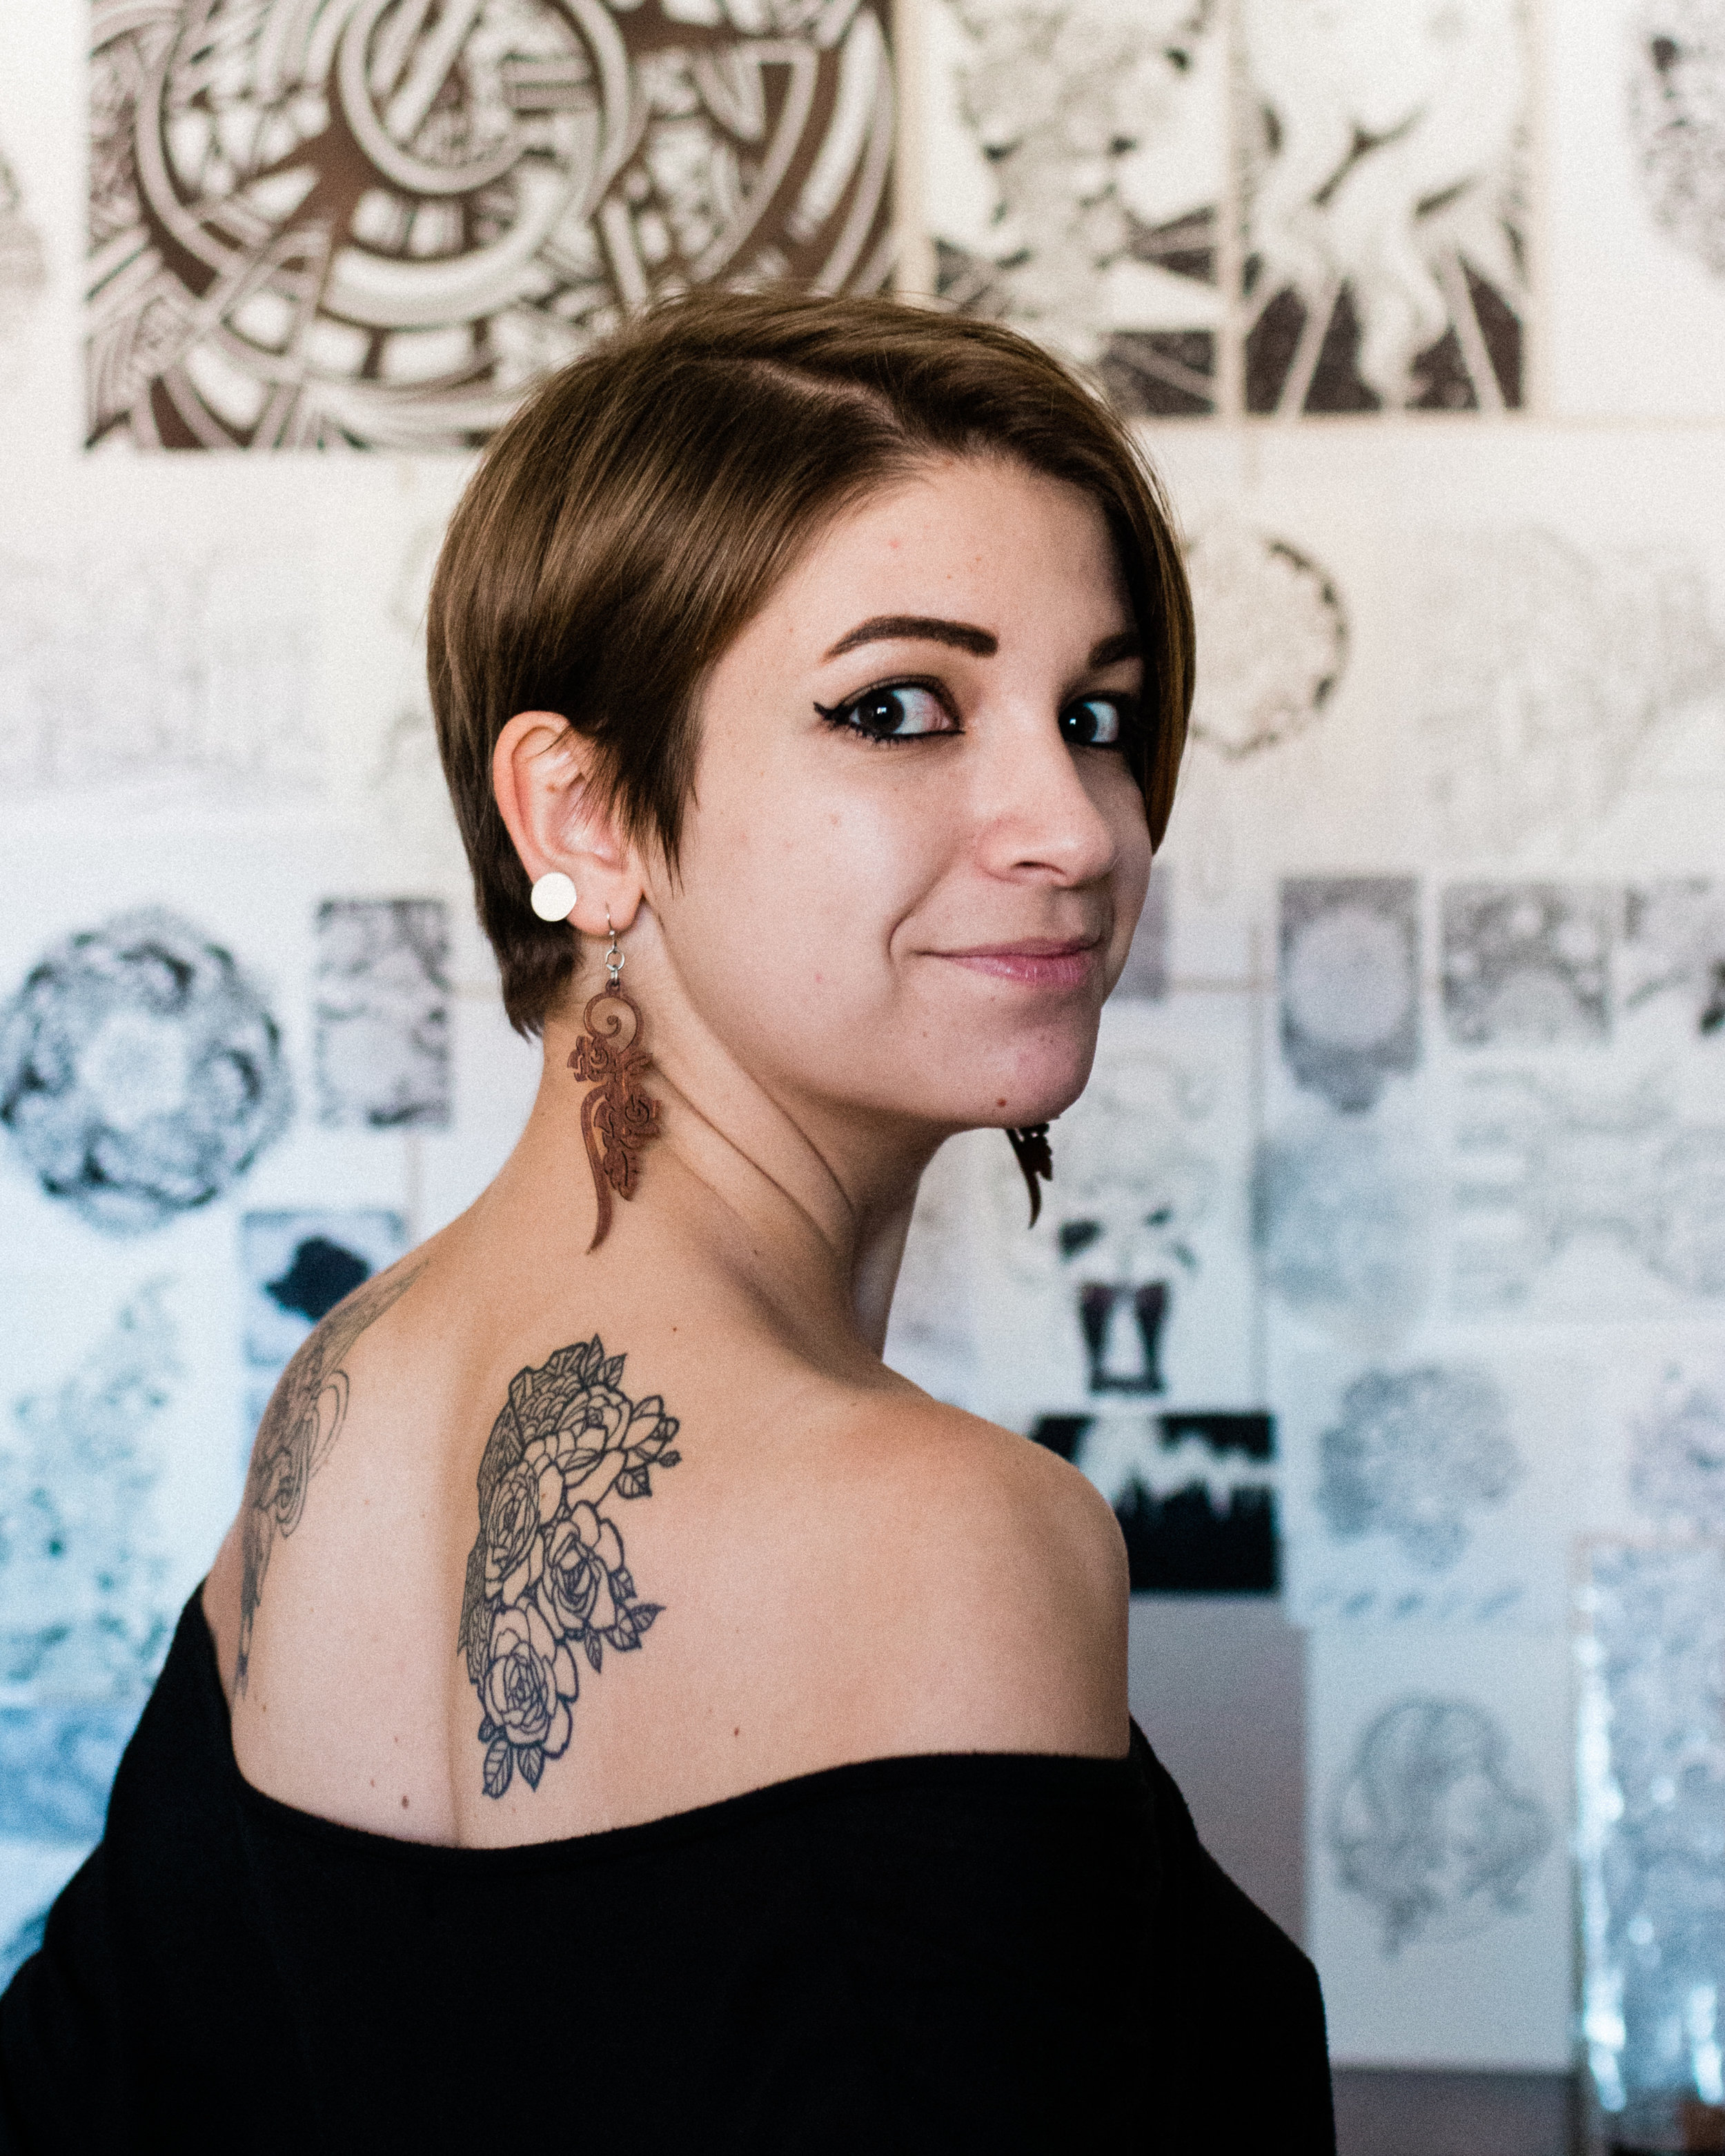 Olivia_Obrecht_Tattoo.jpg